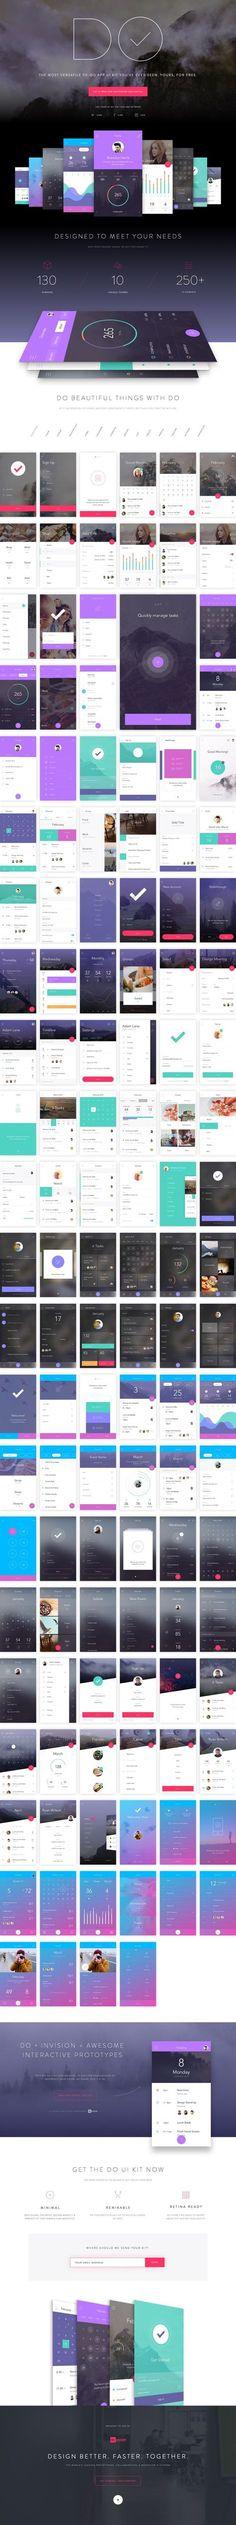 Loves Data Loves || Get DO UI Kit for Photoshop & Sketch by Anton Aheichanka | #UI #userinterface #app